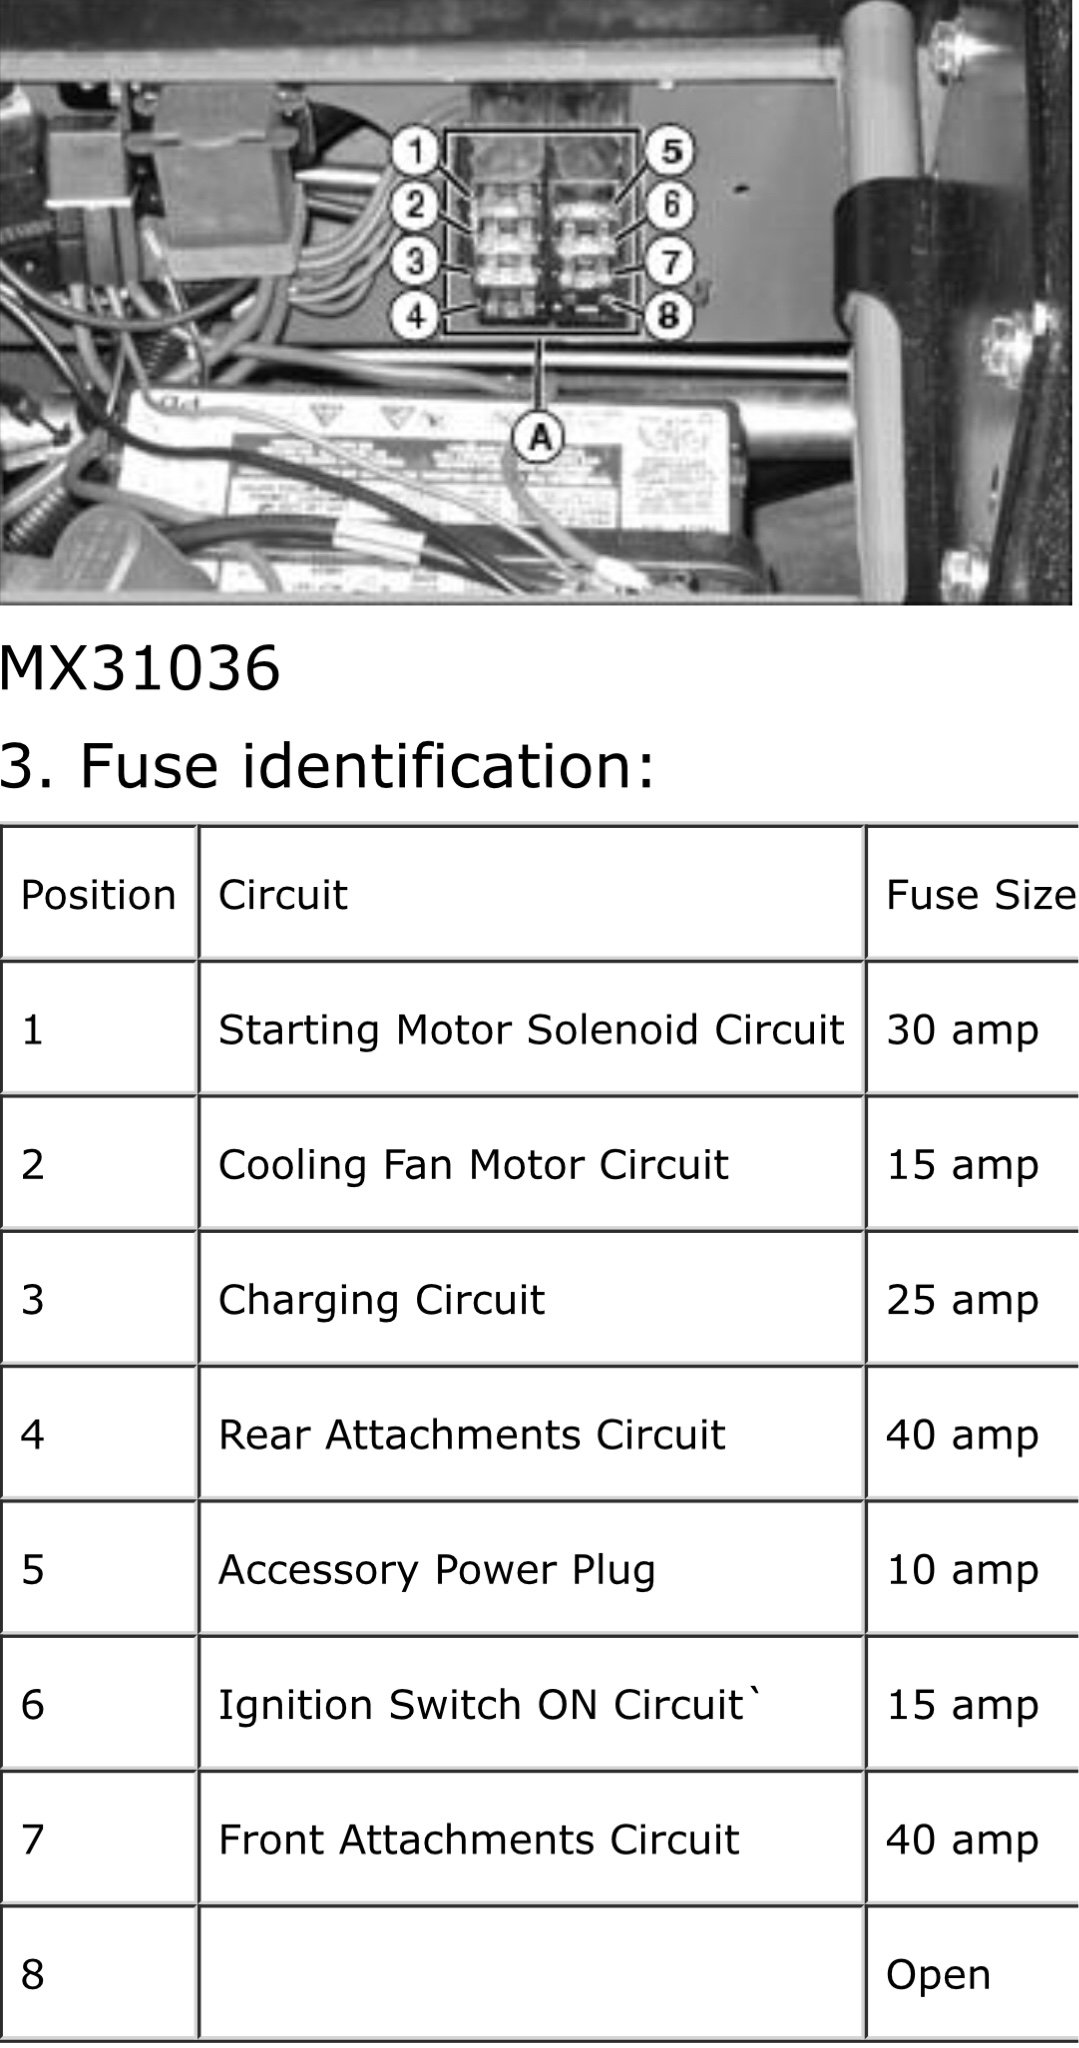 john deere 4120 fuse box - wiring diagram page link-wait -  link-wait.faishoppingconsvitol.it  faishoppingconsvitol.it